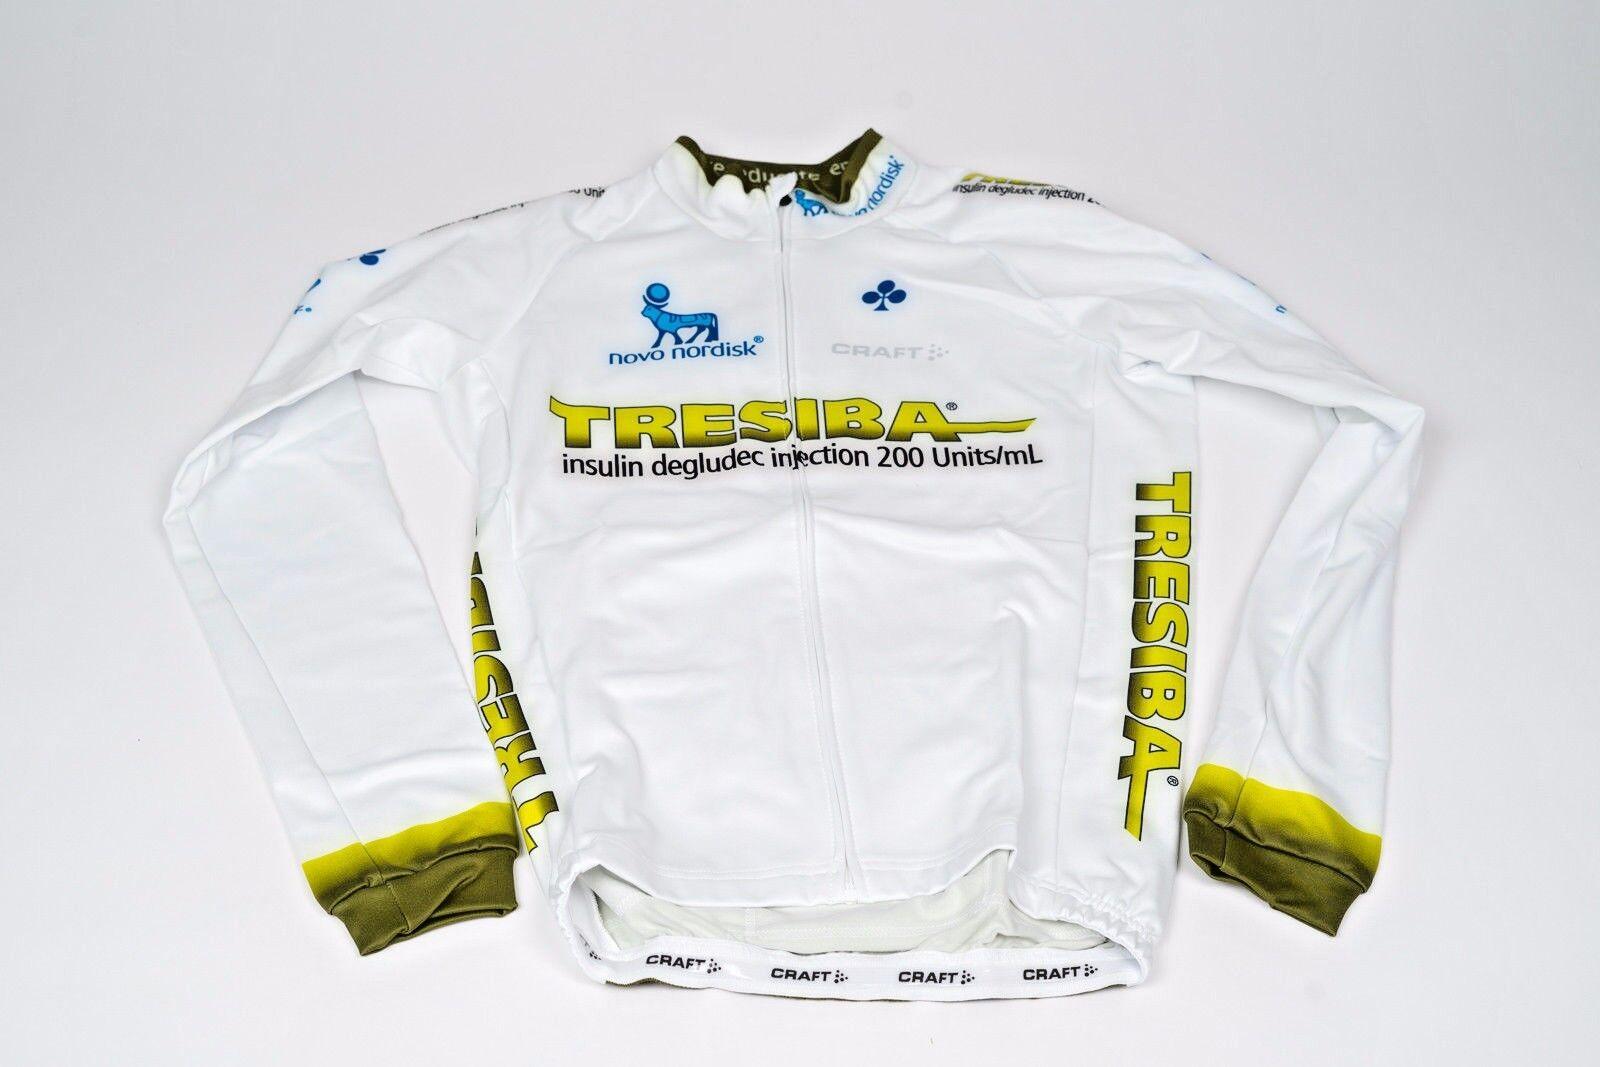 New 2017 Men's Craft Team Novo Nordisk Tresiba EBC Thermal LS Jersey, size XS